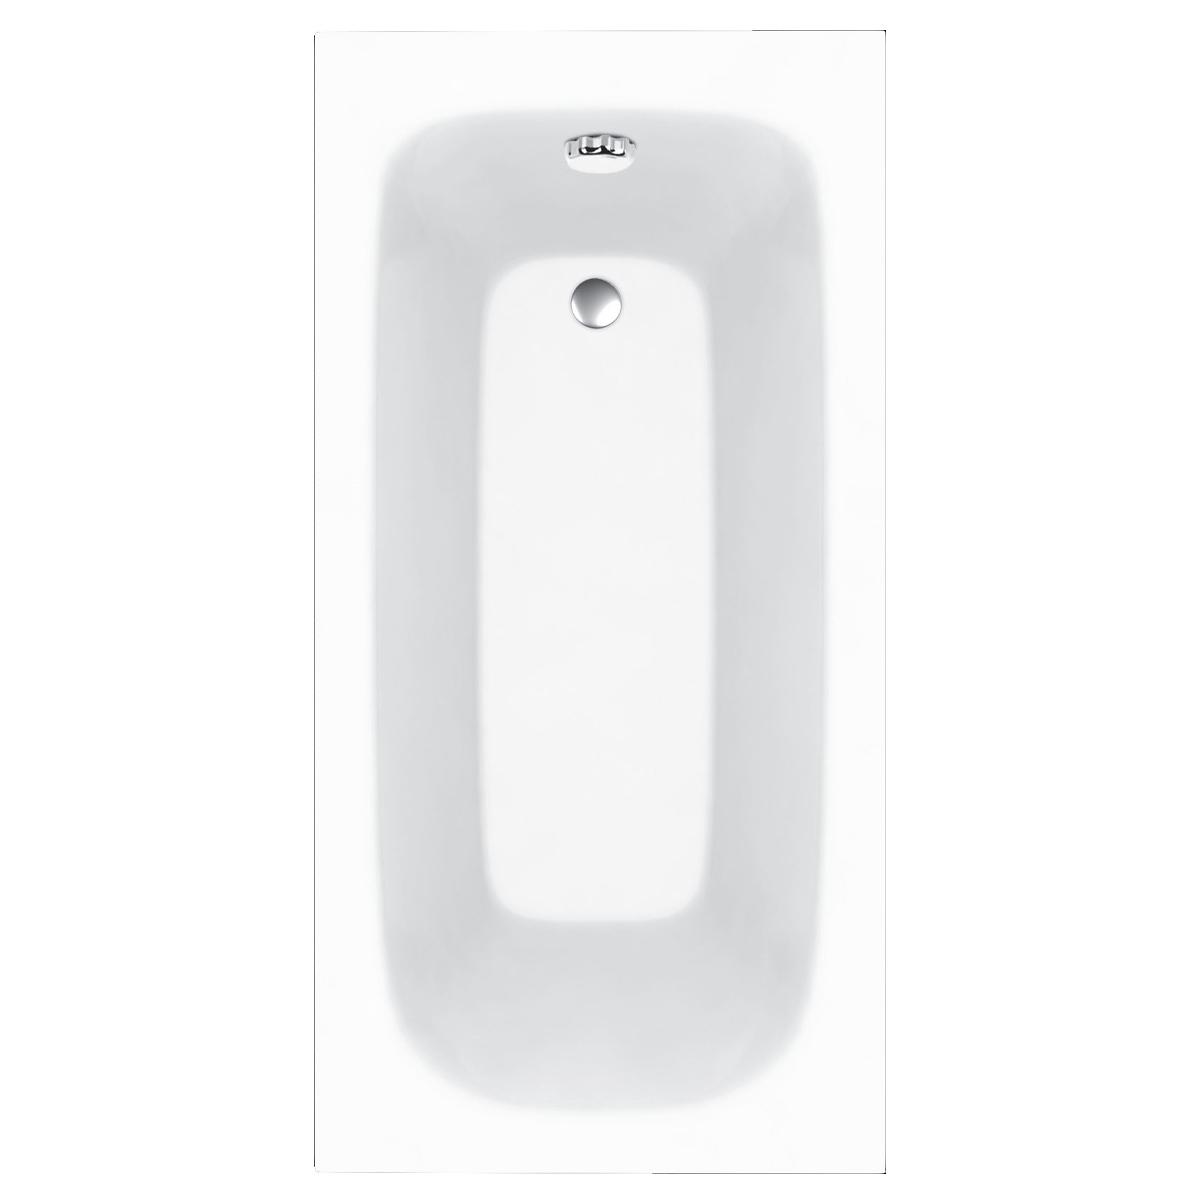 K-Vit G4K 1675 x 700 Contract Bath